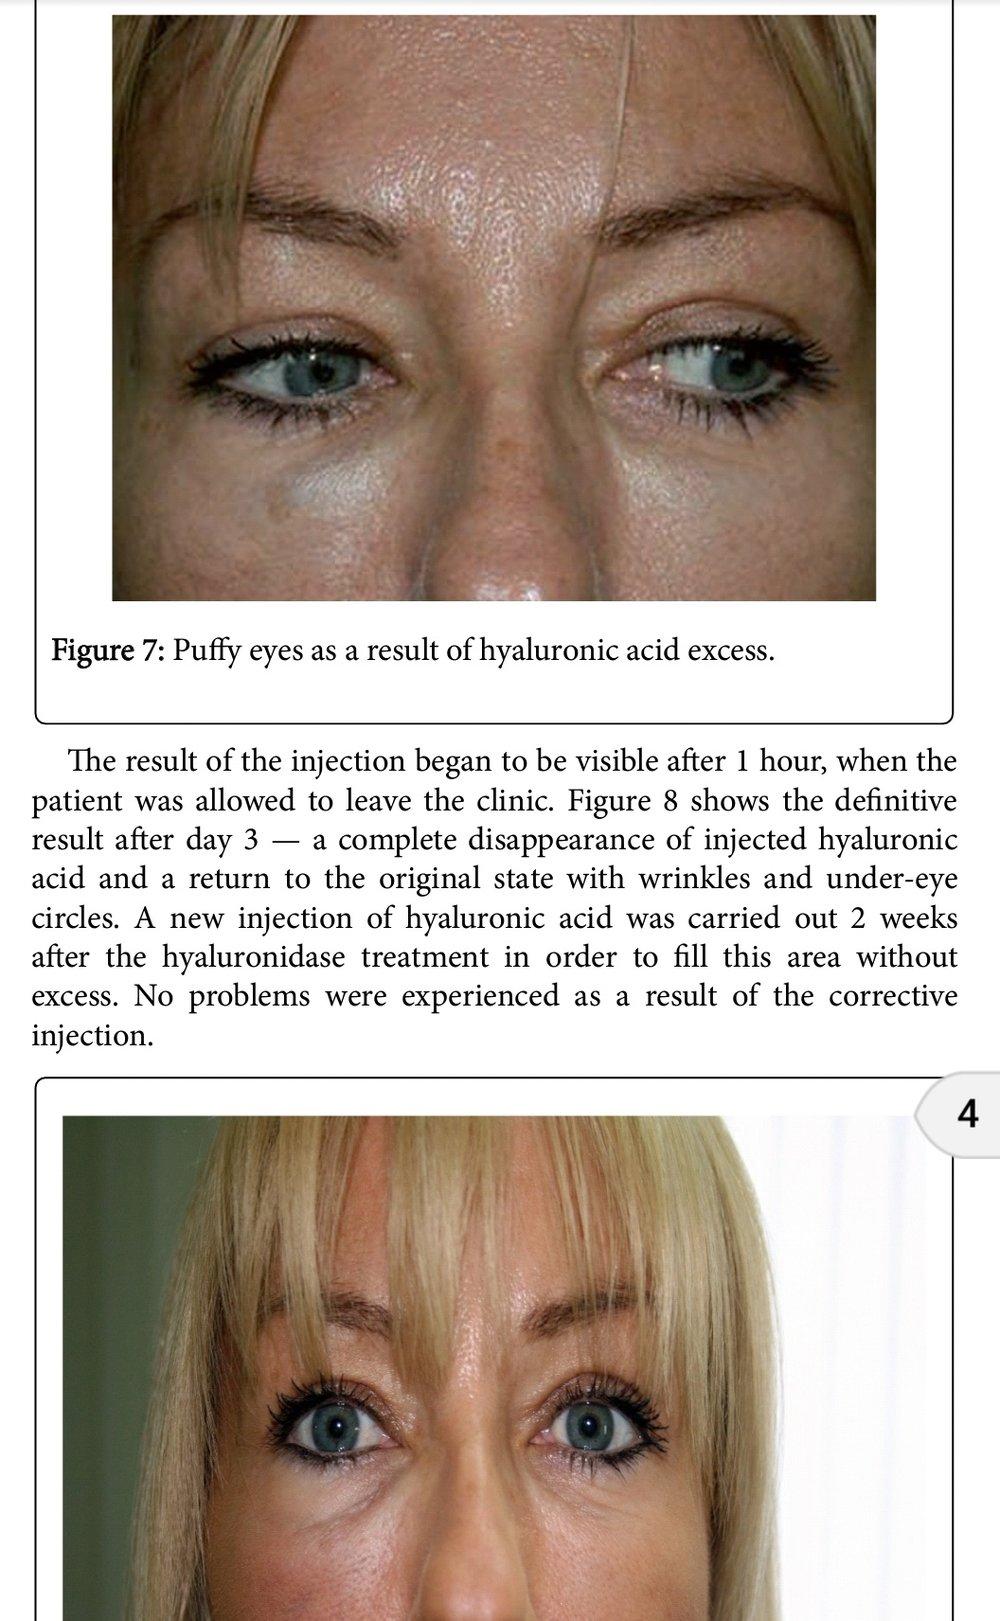 Incorrect Filler Corrected With Hyaluronidase / Hyalase